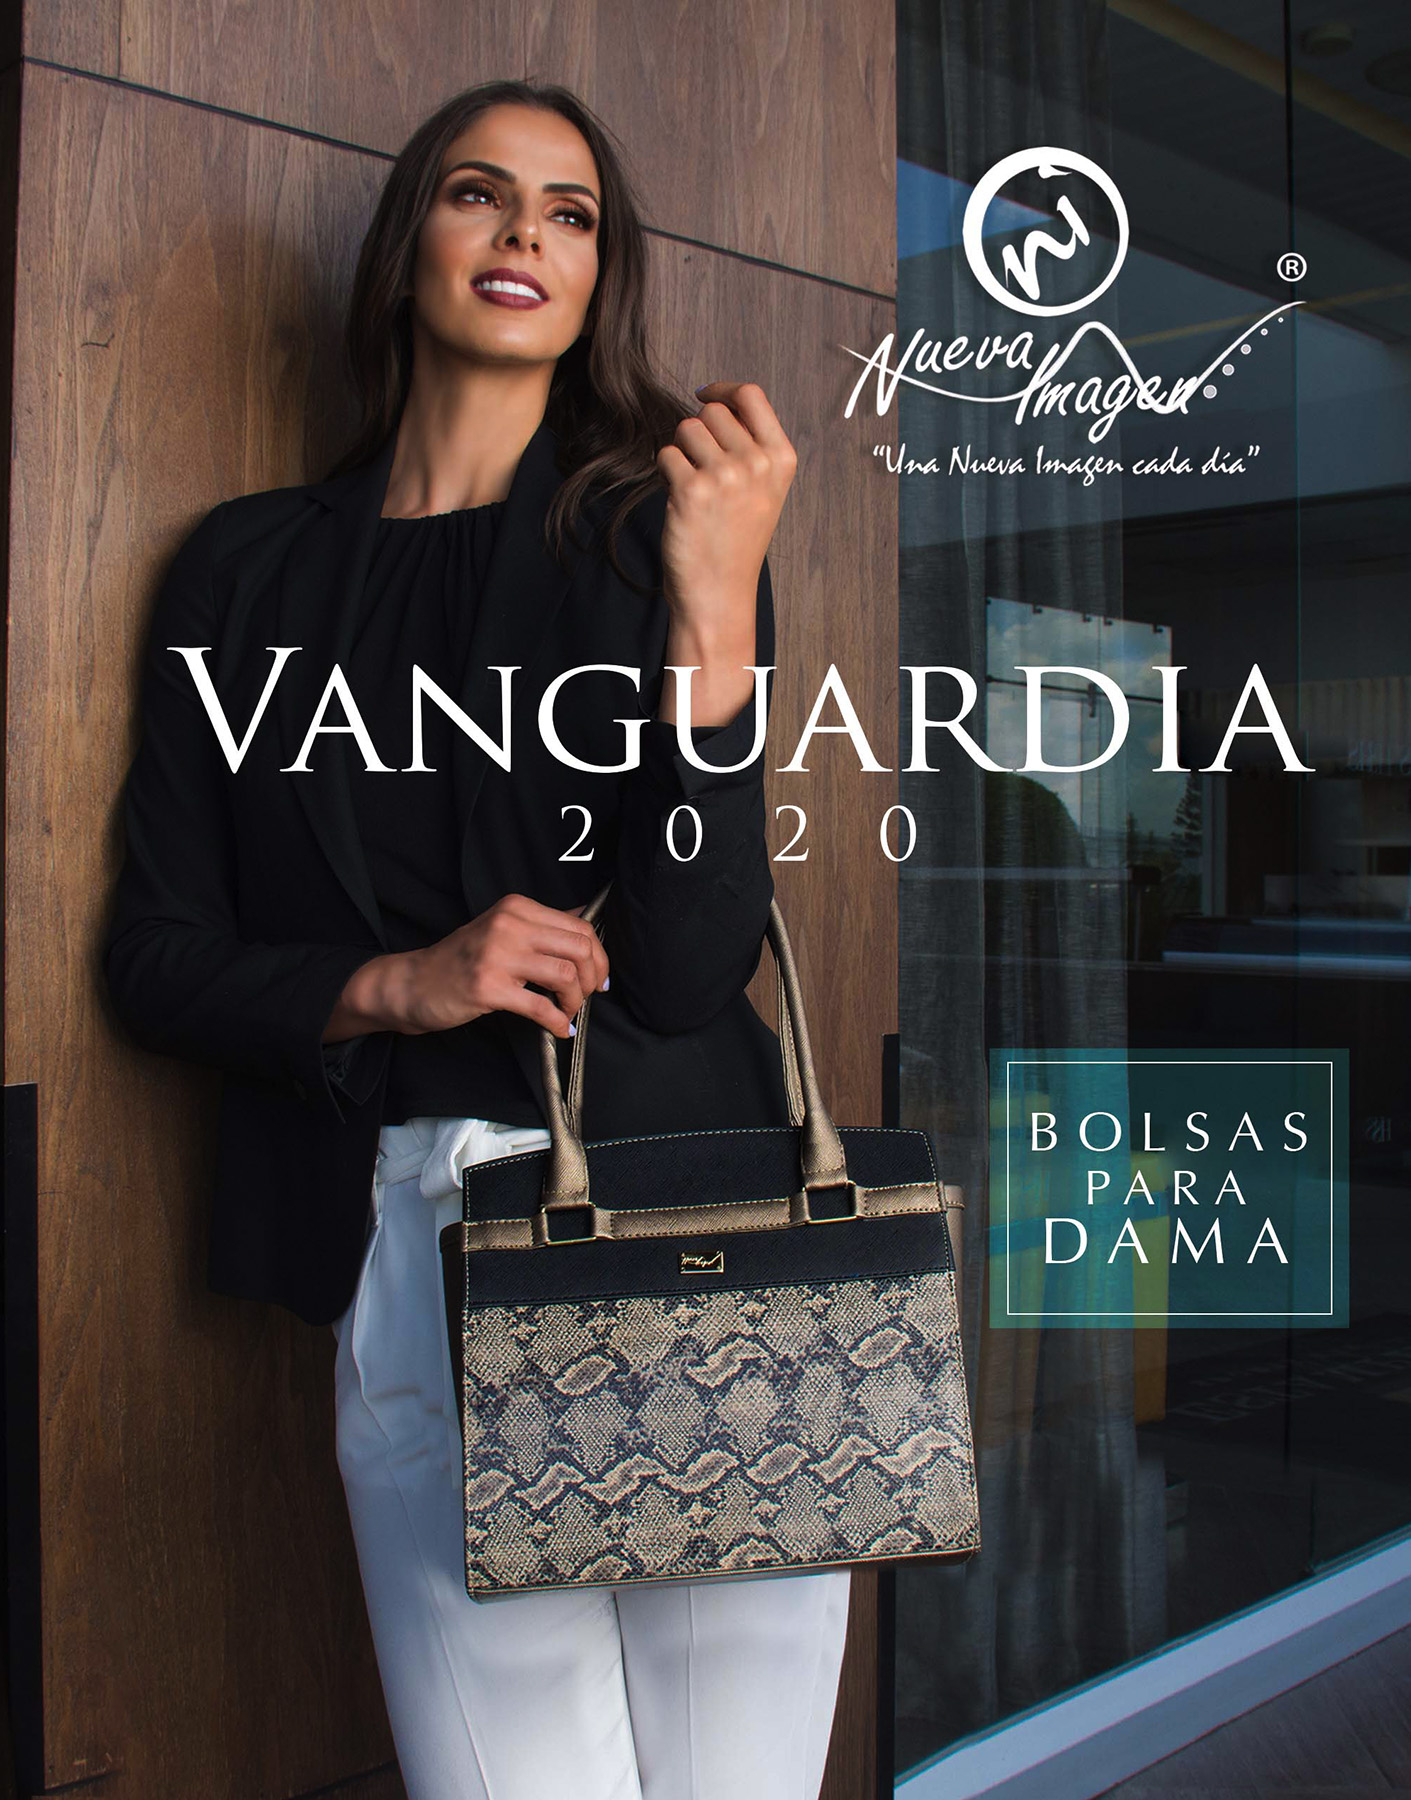 Catalogo Vanguardia 2020